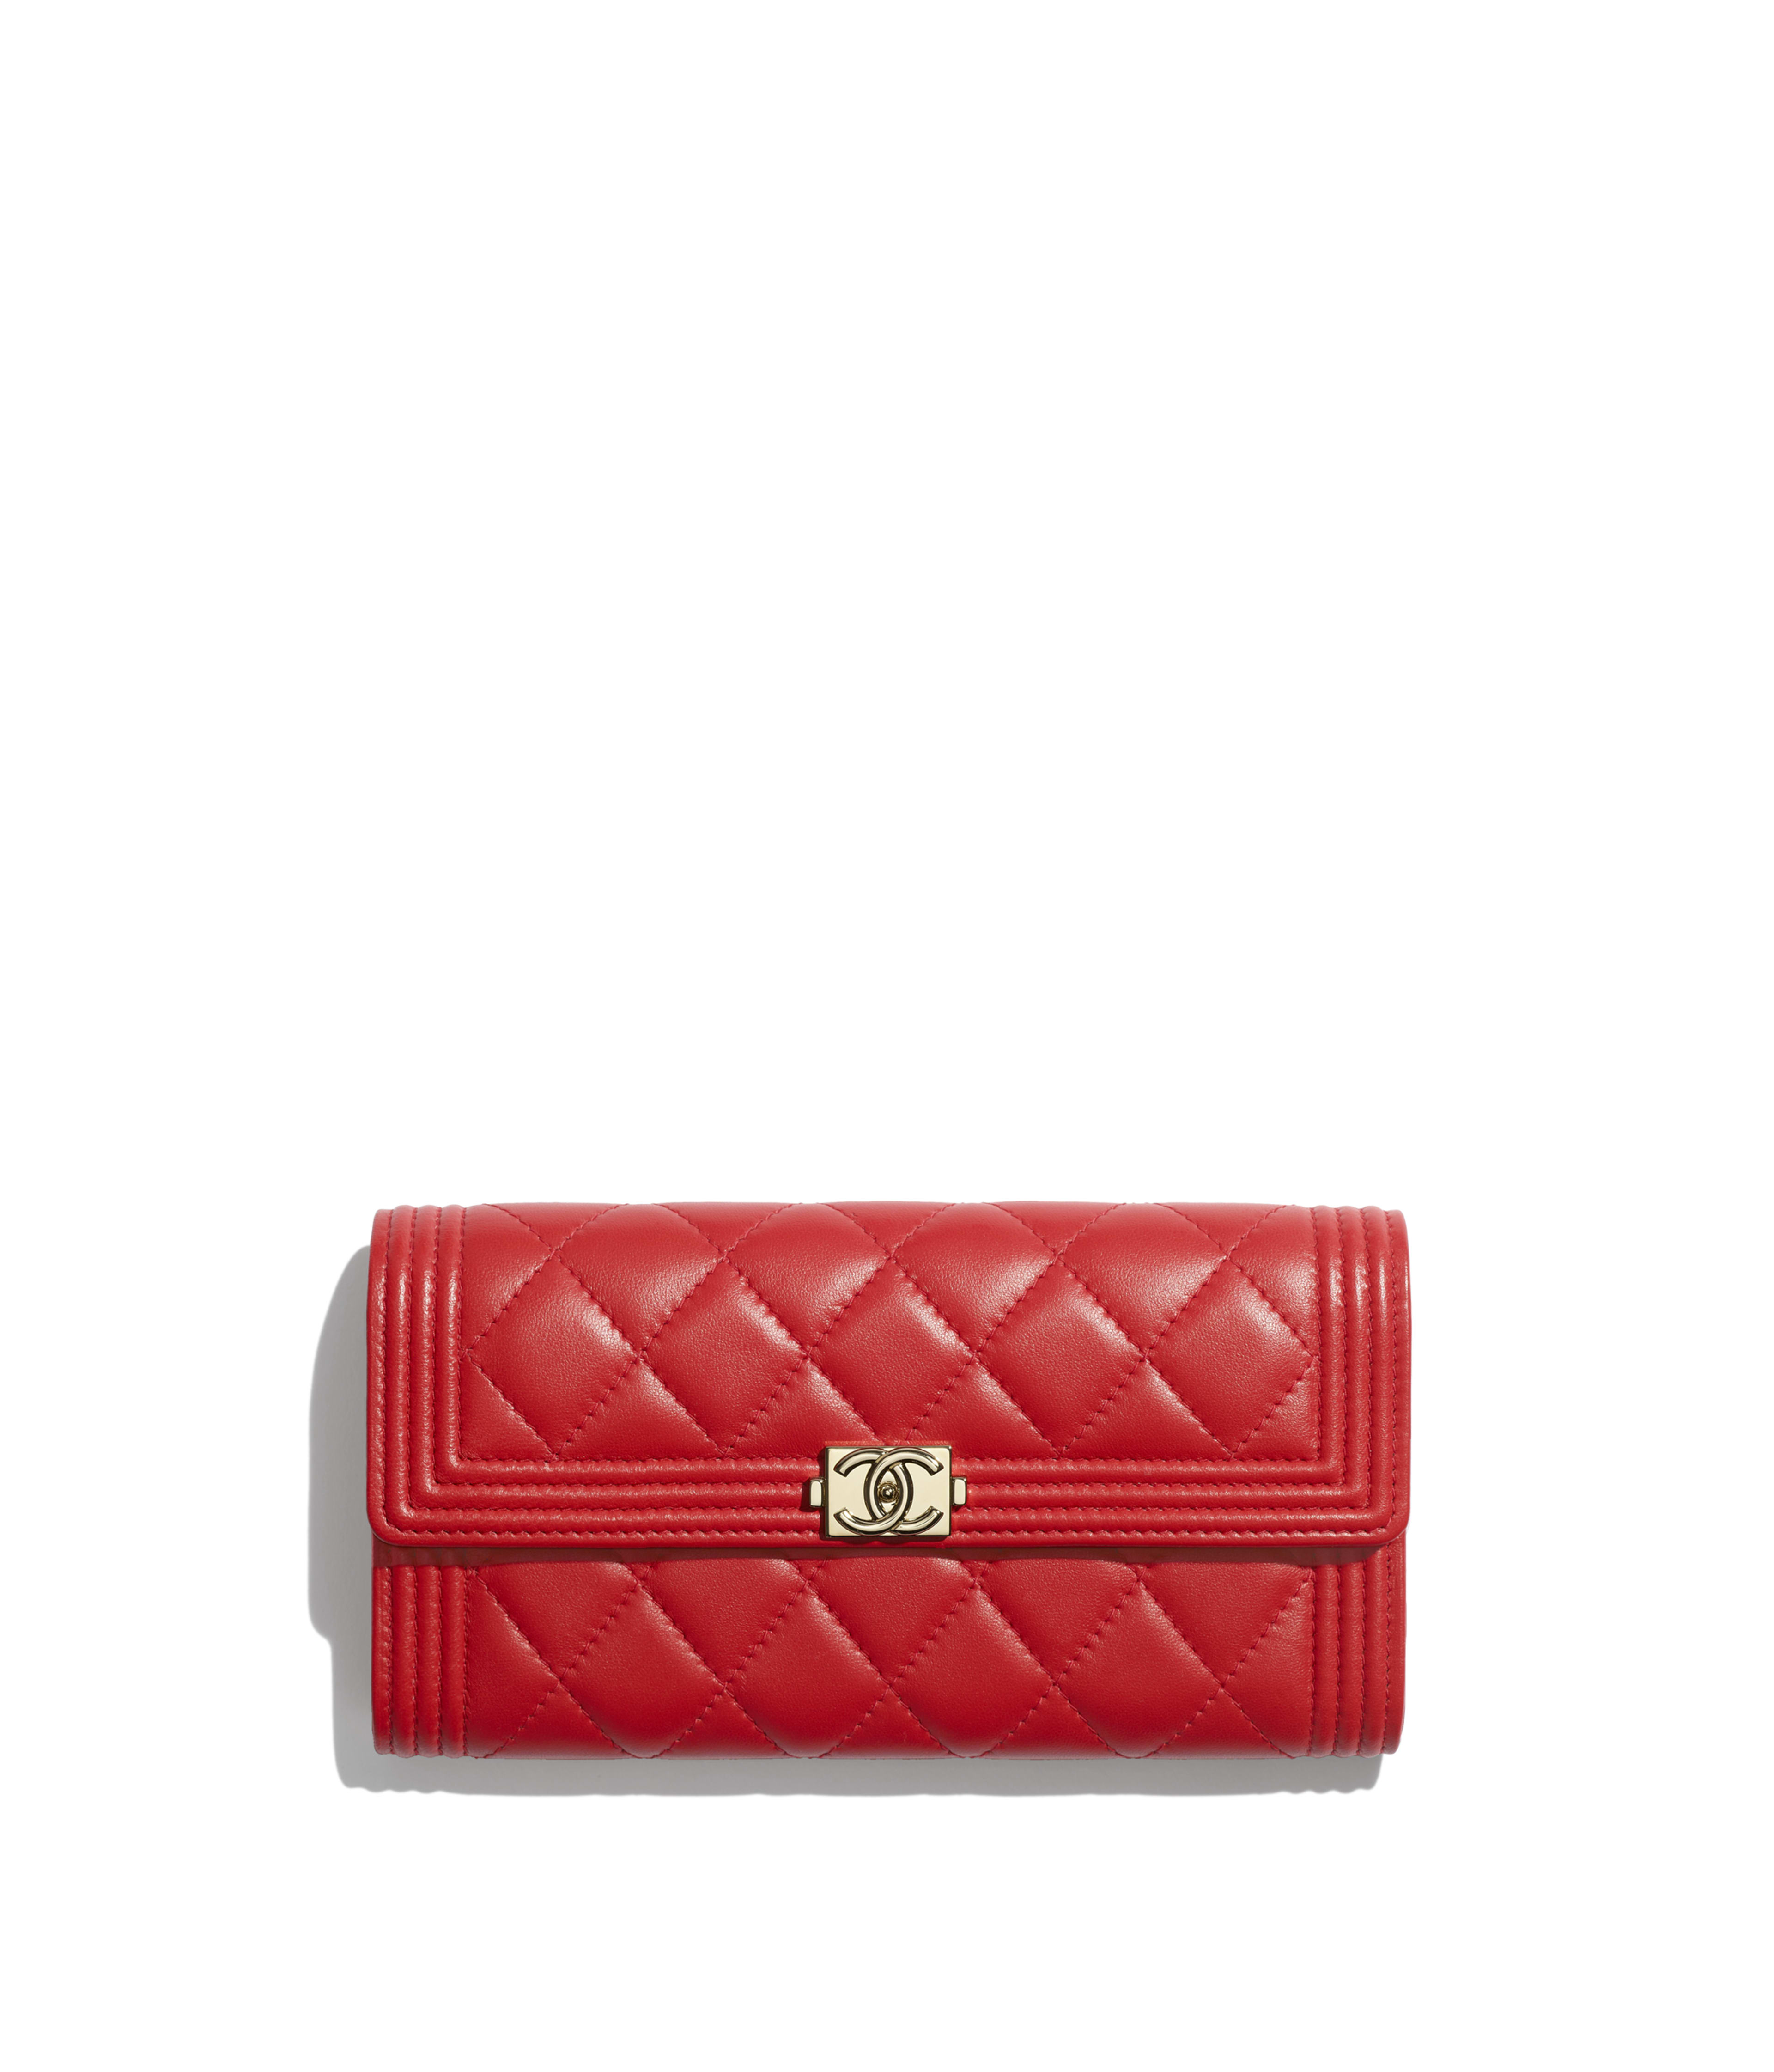 90f5bf4f507cd4 BOY CHANEL Long Flap Wallet Lambskin & Gold-Tone Metal, Red Ref.  A80286Y04059N0413